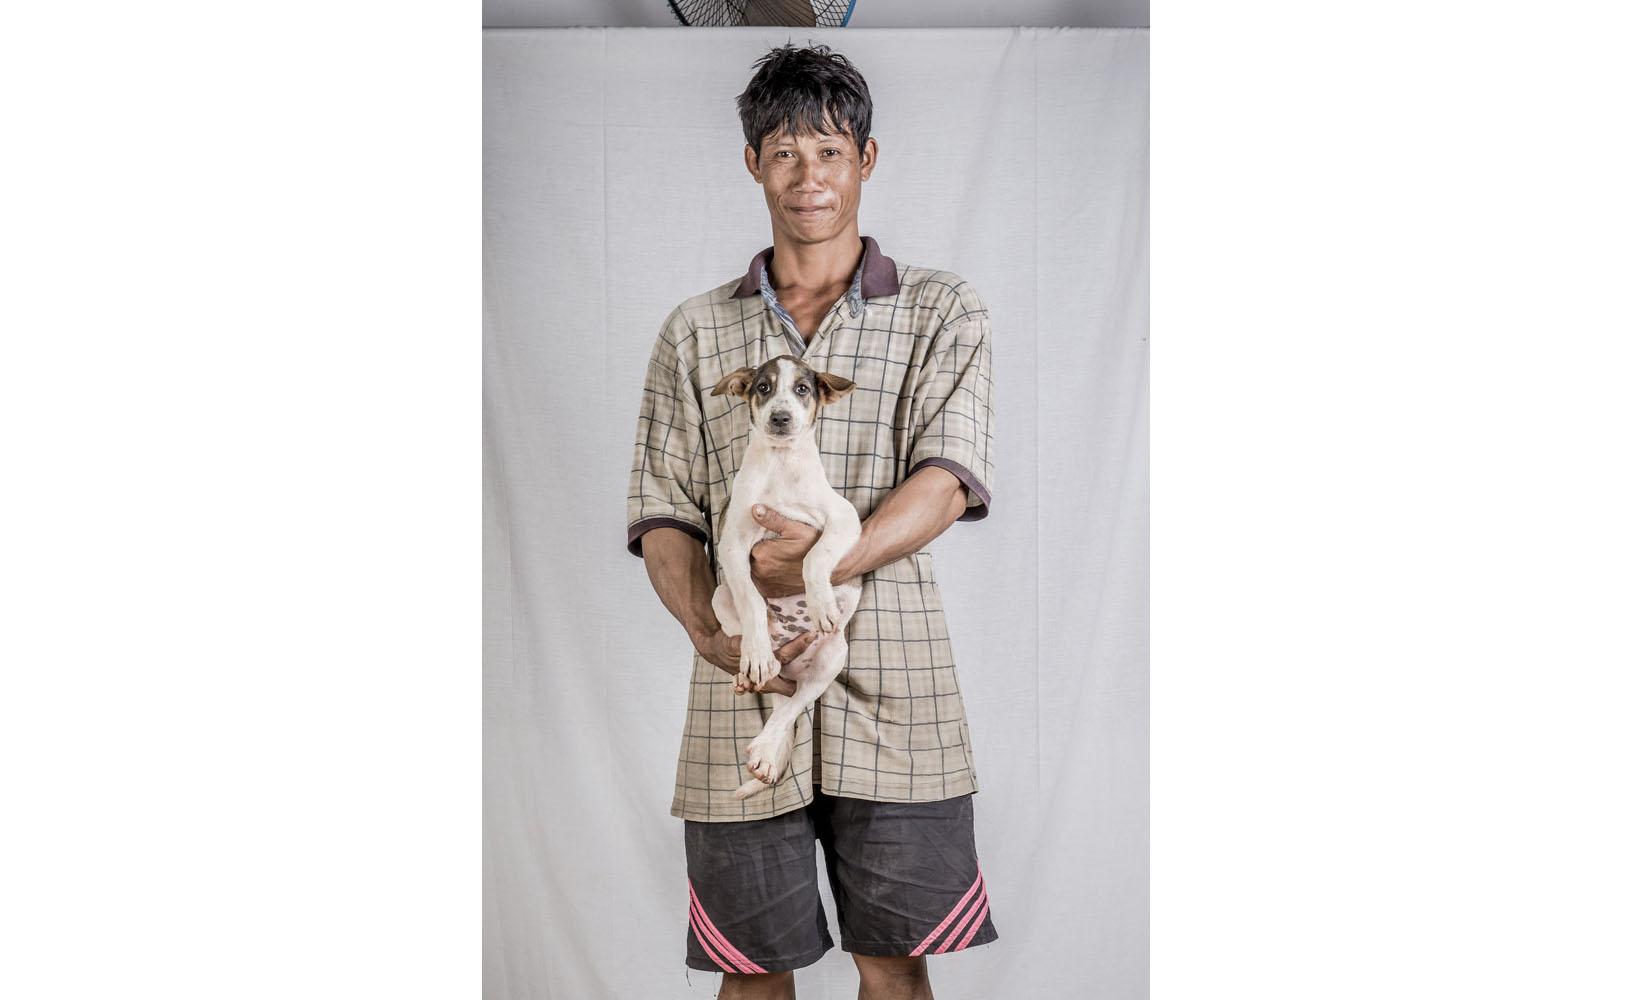 2012_012_TabCo_VWB_Laos_ERN_7793